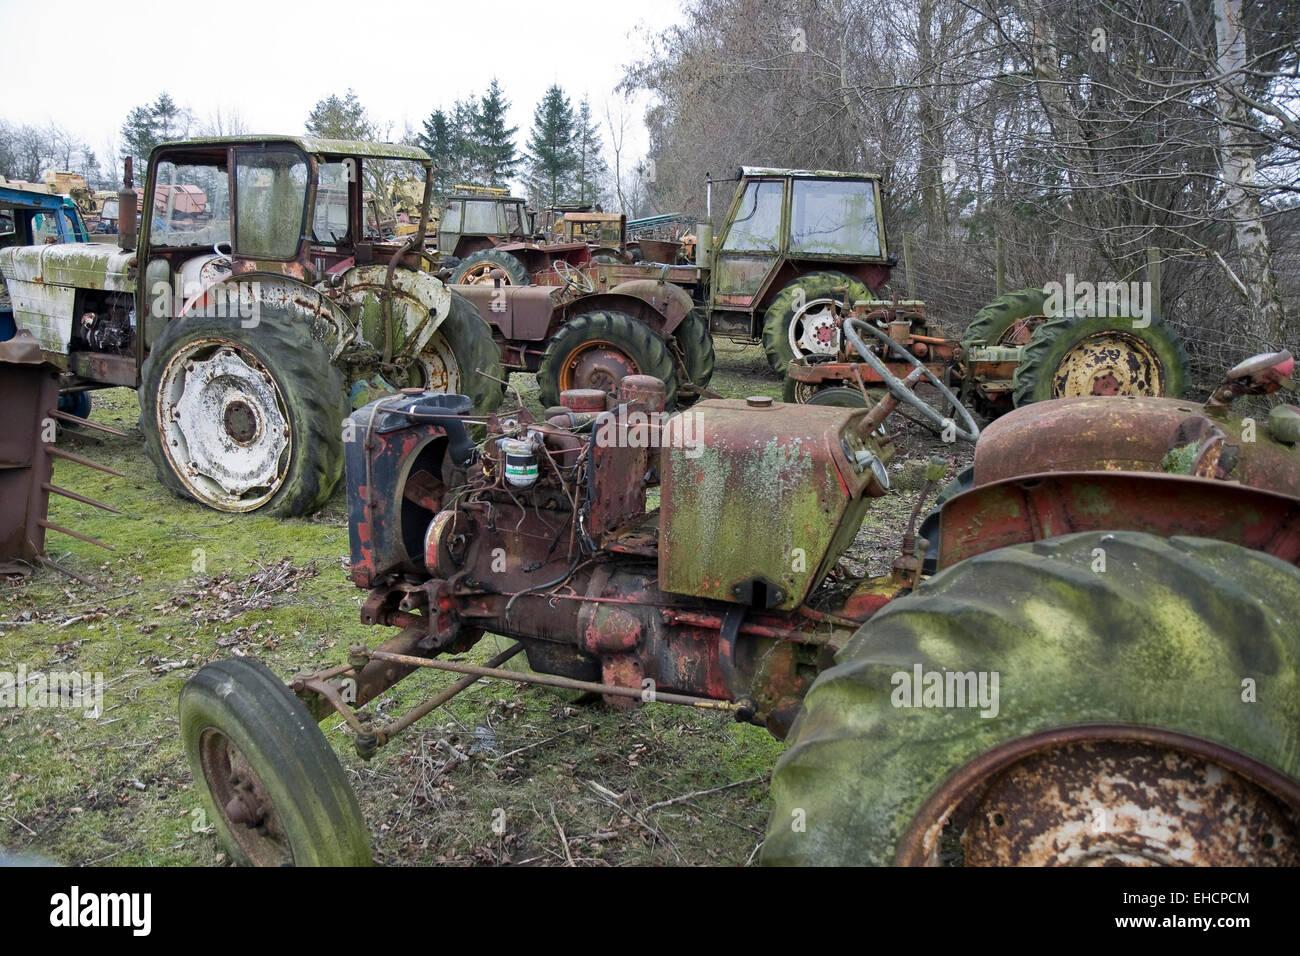 Old tractors on a scrap yard in jutland denmark stock for Scrap tractor tires